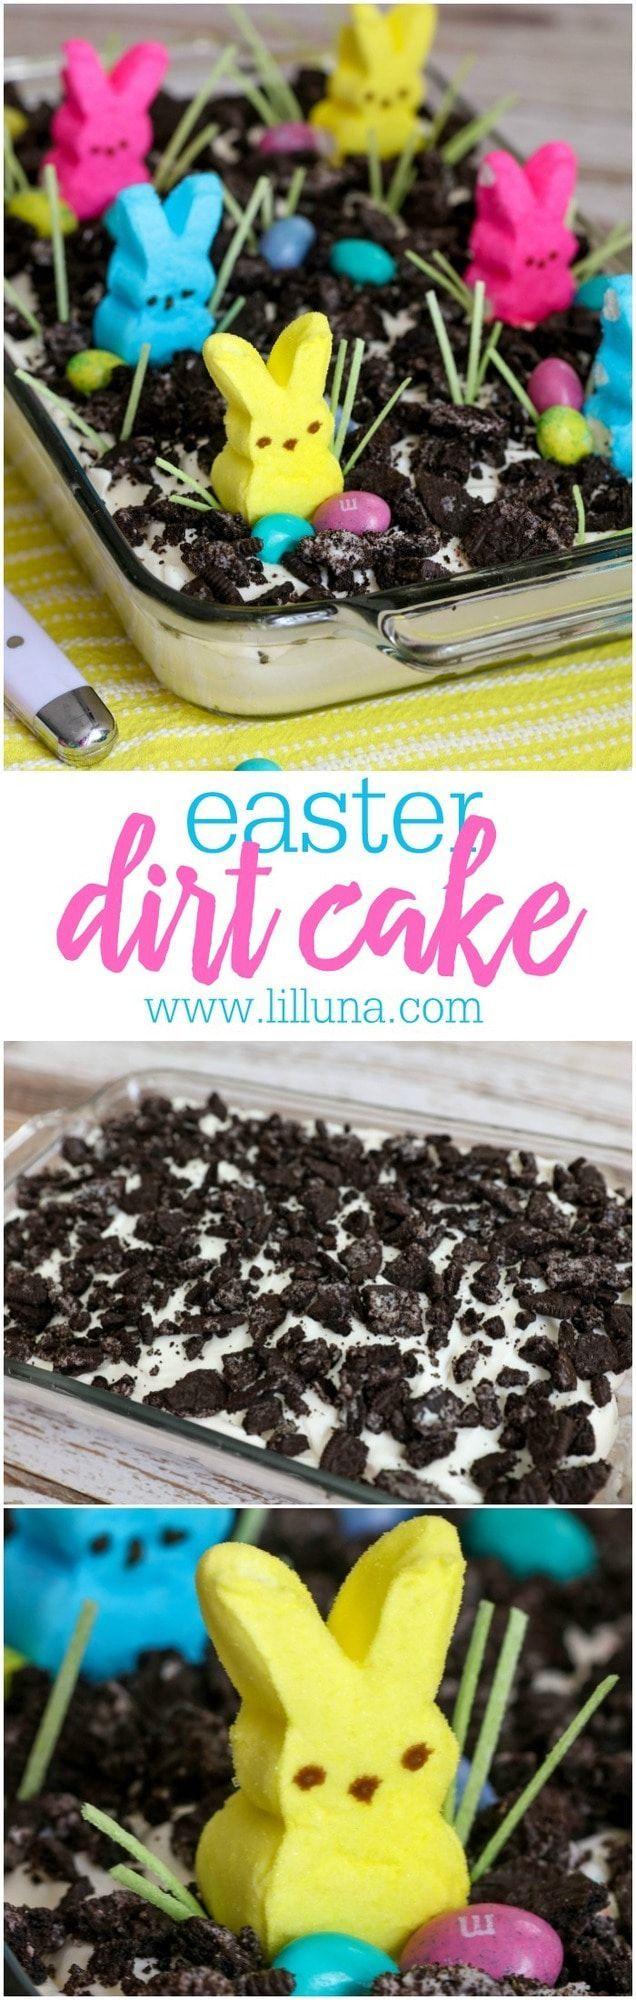 Easter Dirt Cake Recipe Easter Dirt Cake Recipe Dirt Cake